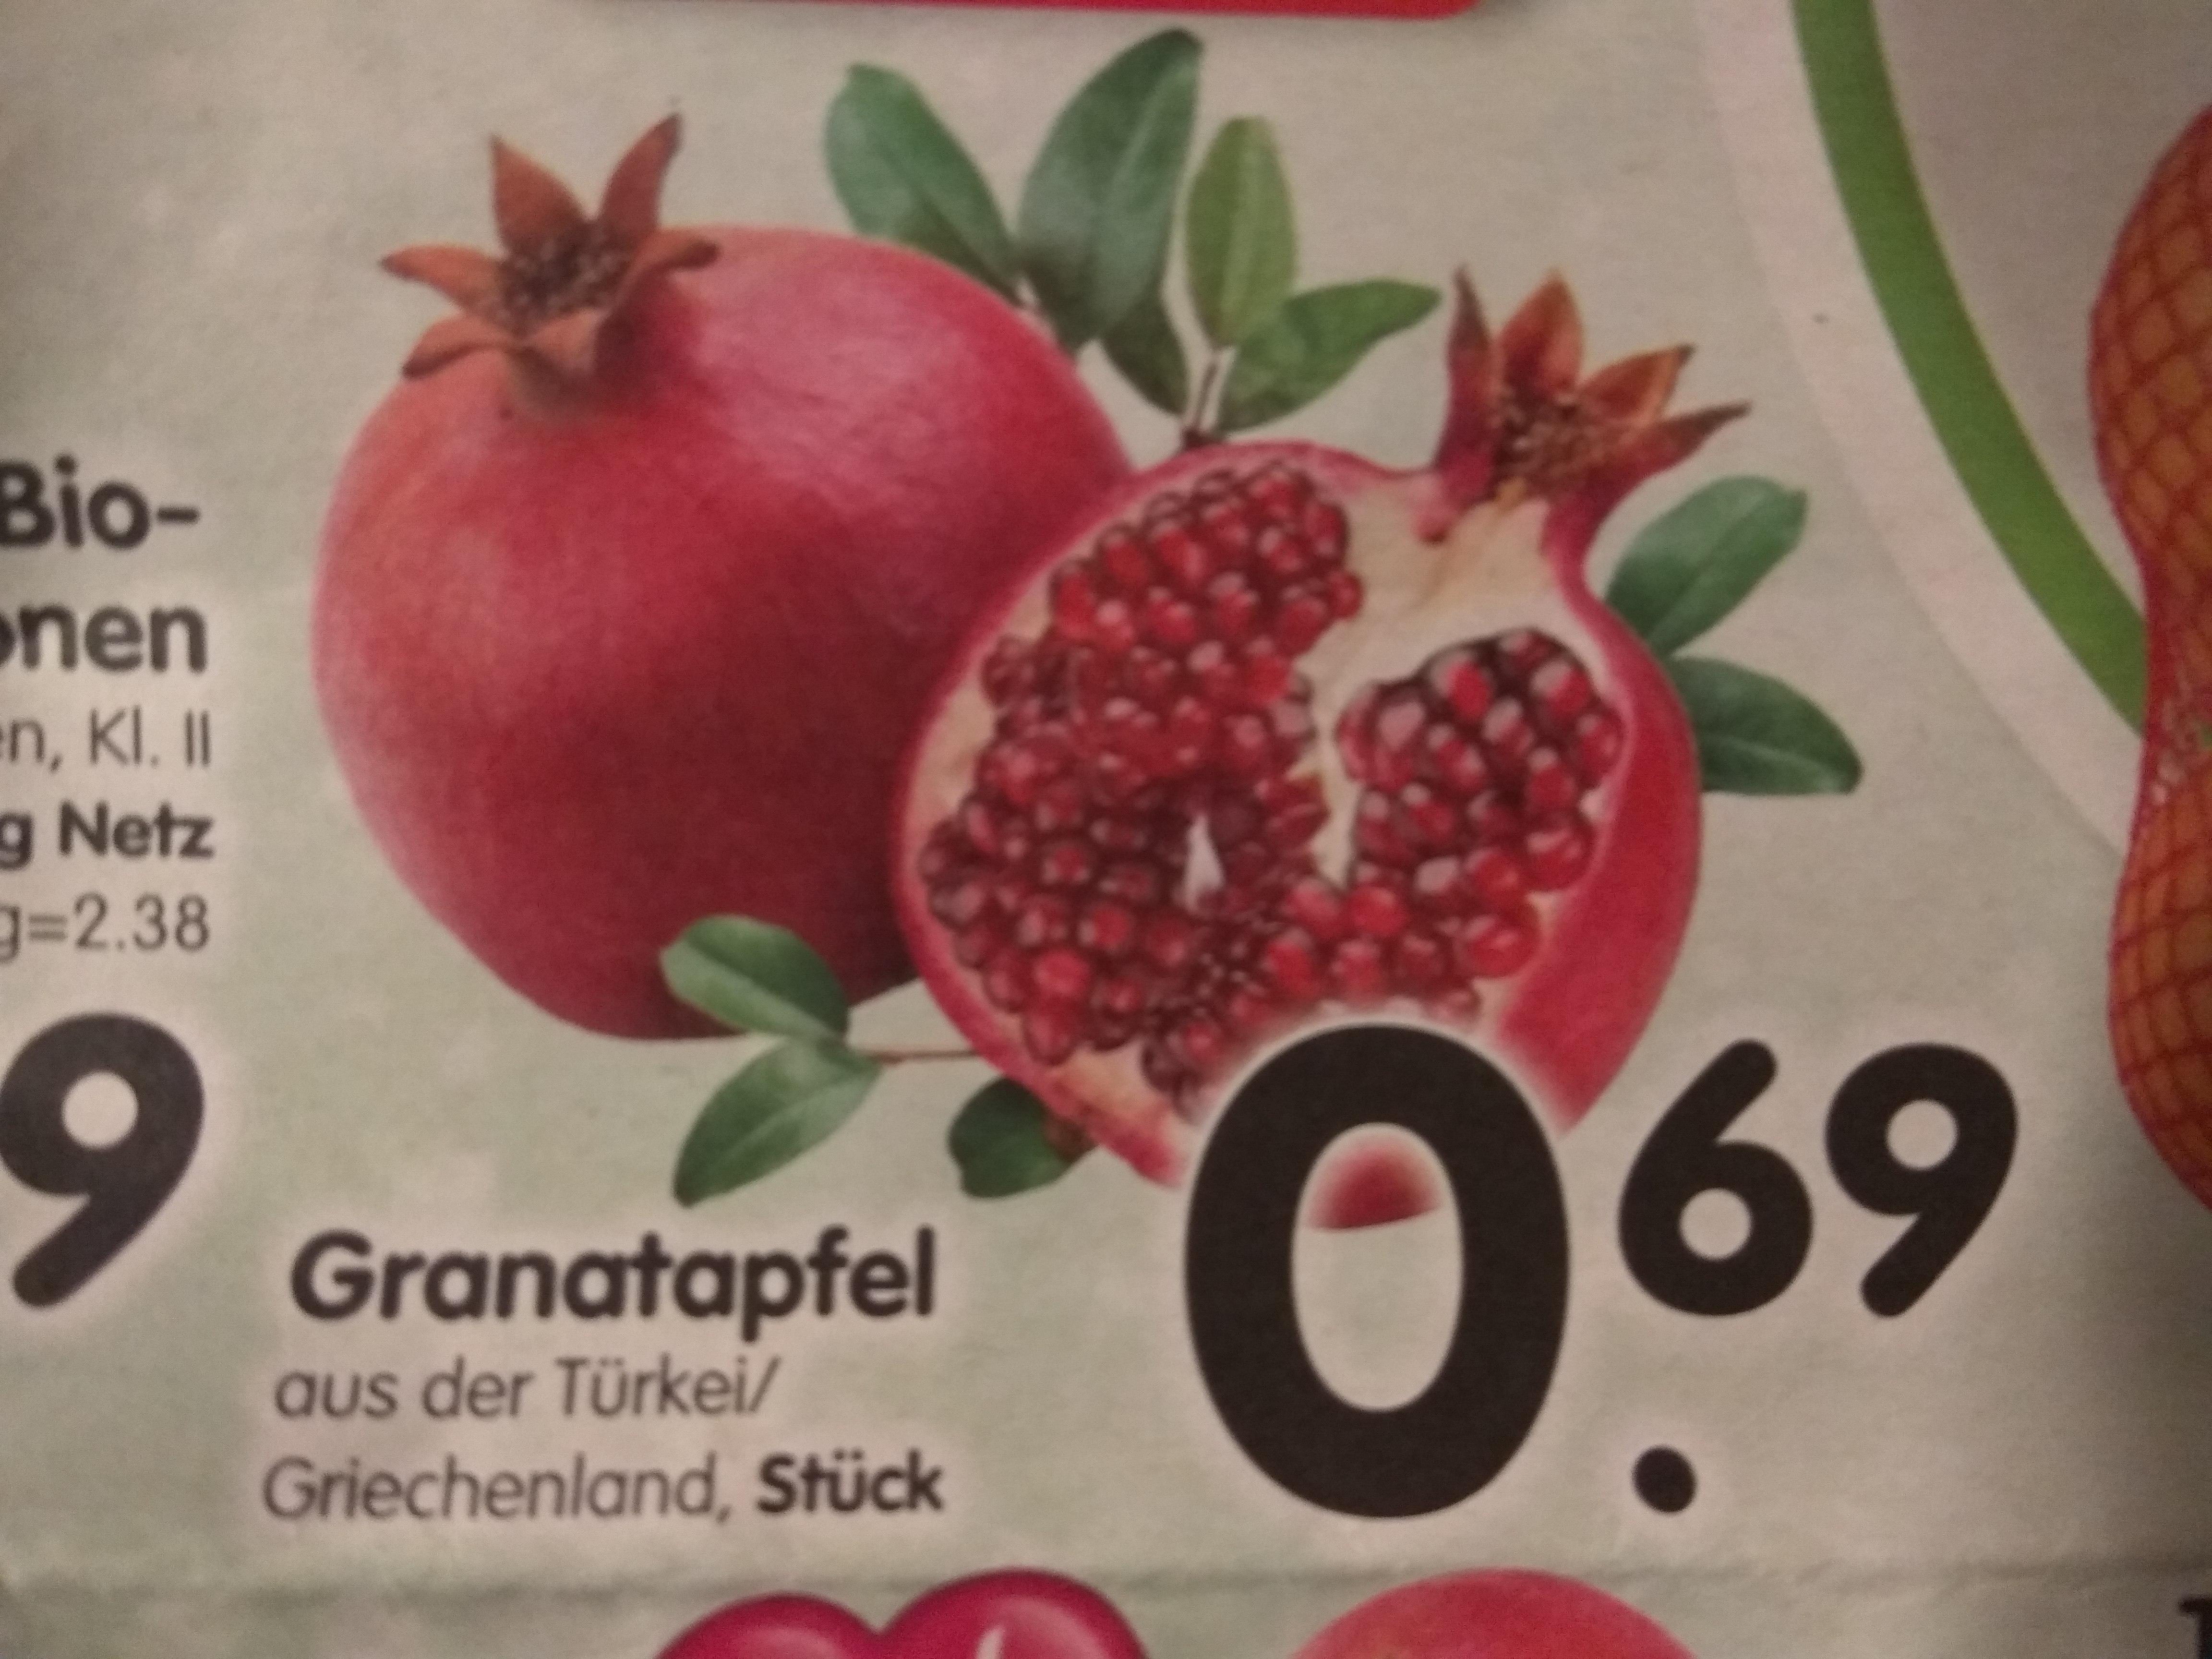 Granatapfel Edeka Südbayern evtl Bundesweit